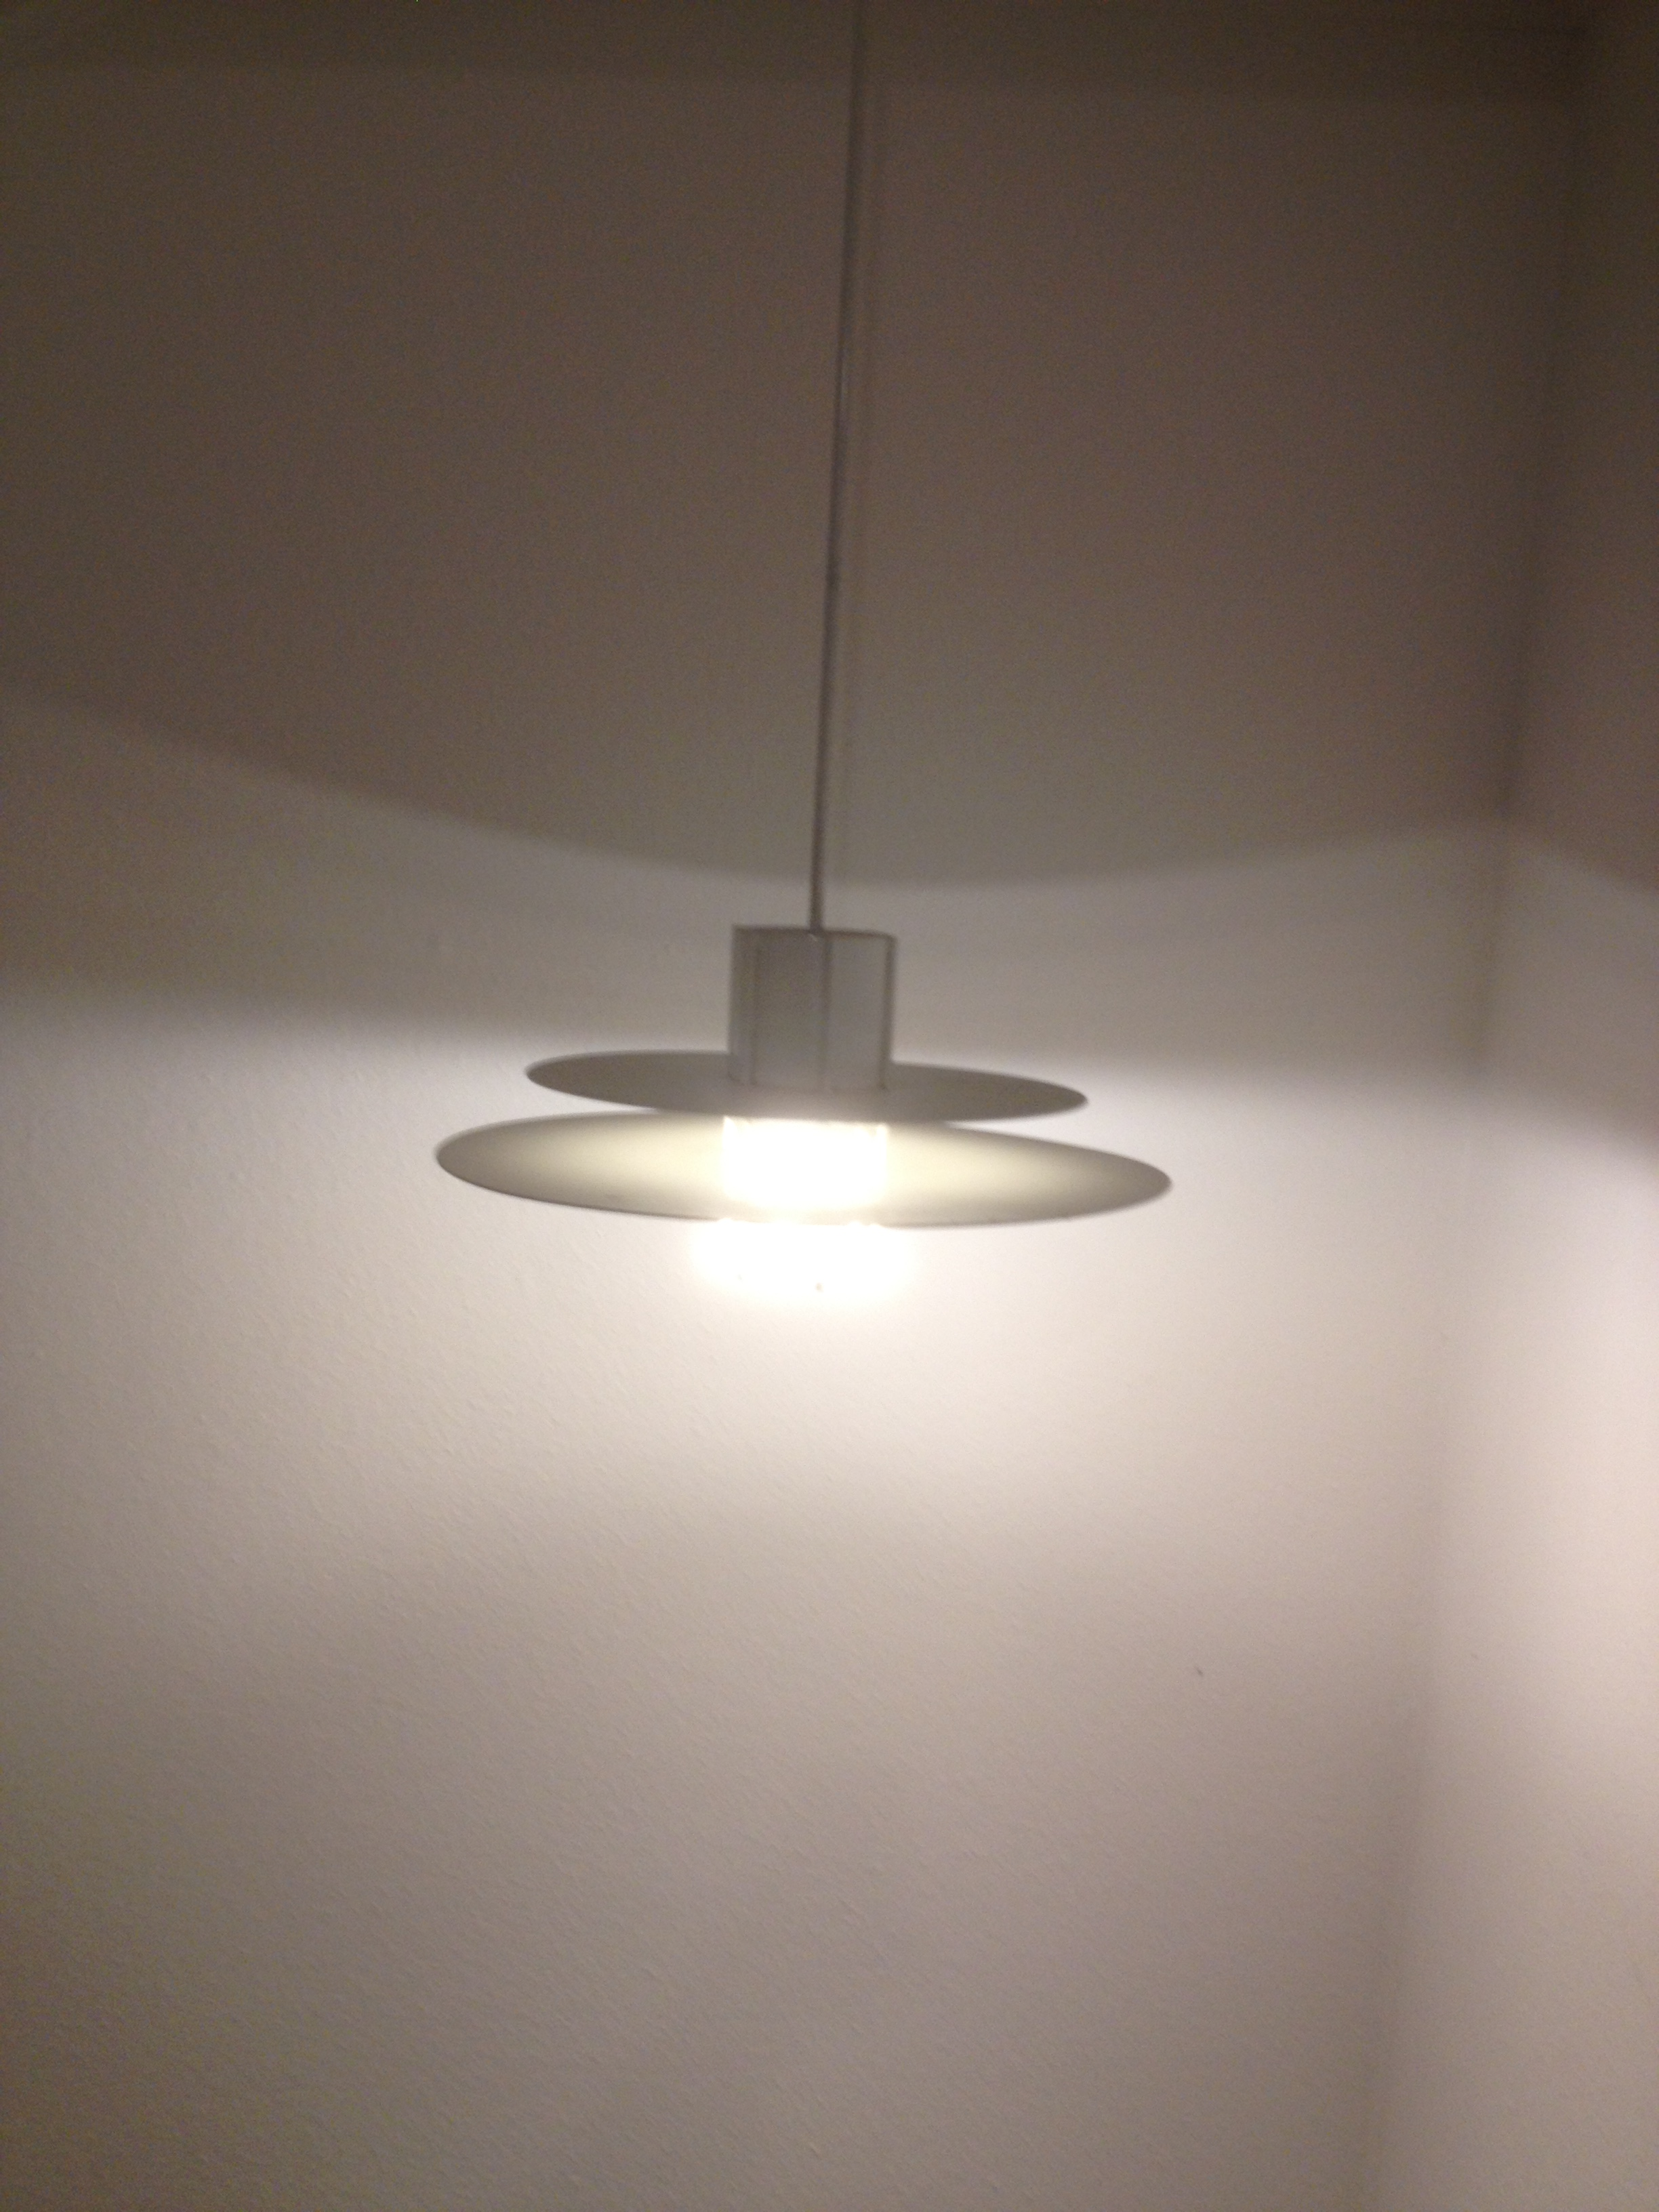 designer deckenlampe von louis poulsen oder m ller jensen design klassiker unsere kategorien. Black Bedroom Furniture Sets. Home Design Ideas